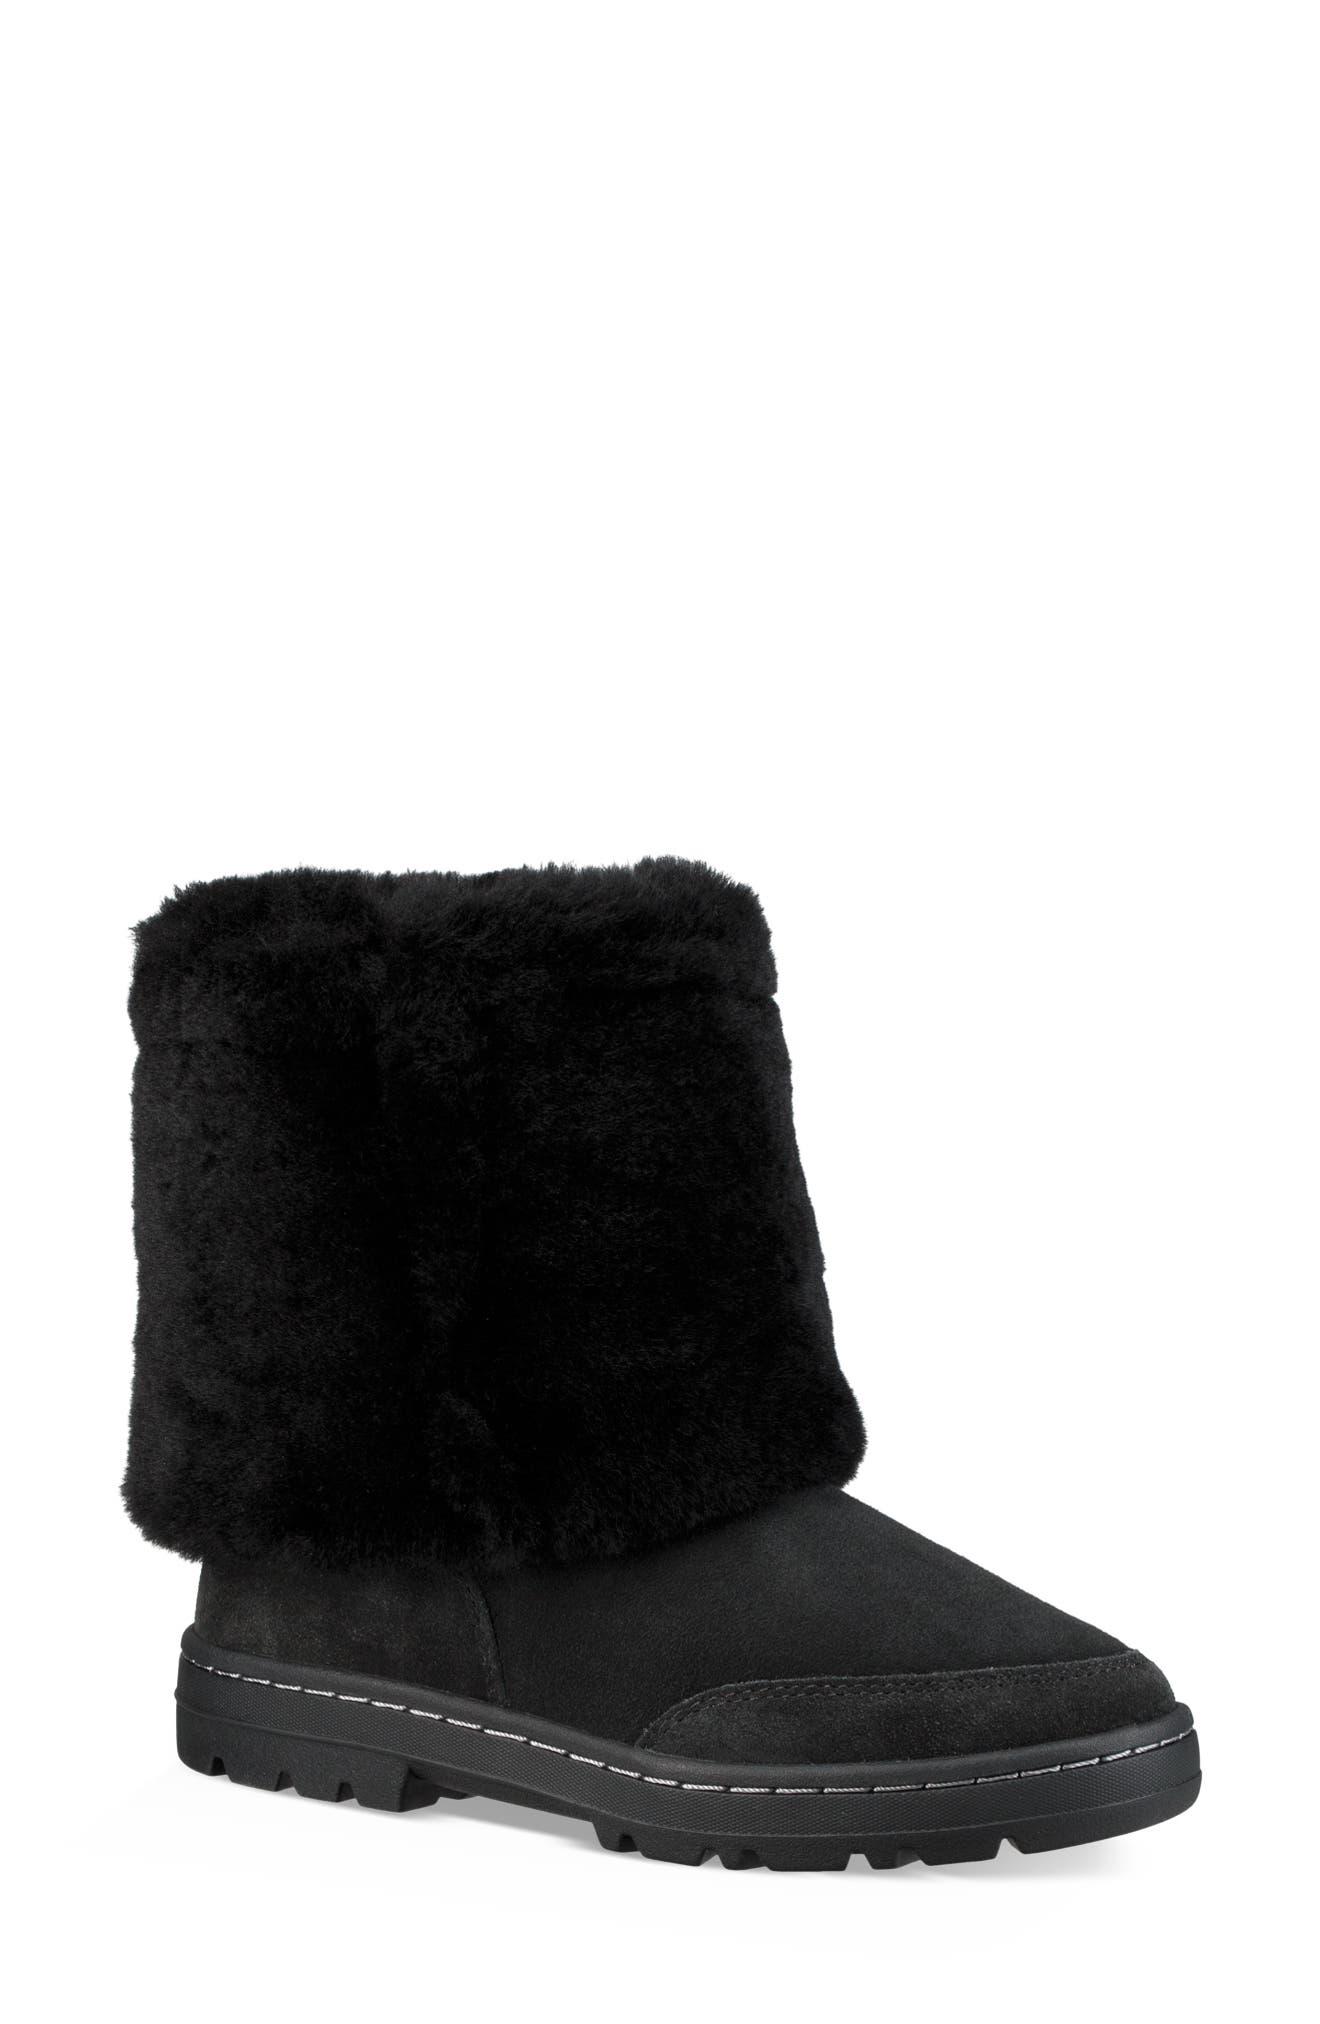 Sundance Revival Genuine Shearling Boot,                             Alternate thumbnail 8, color,                             BLACK